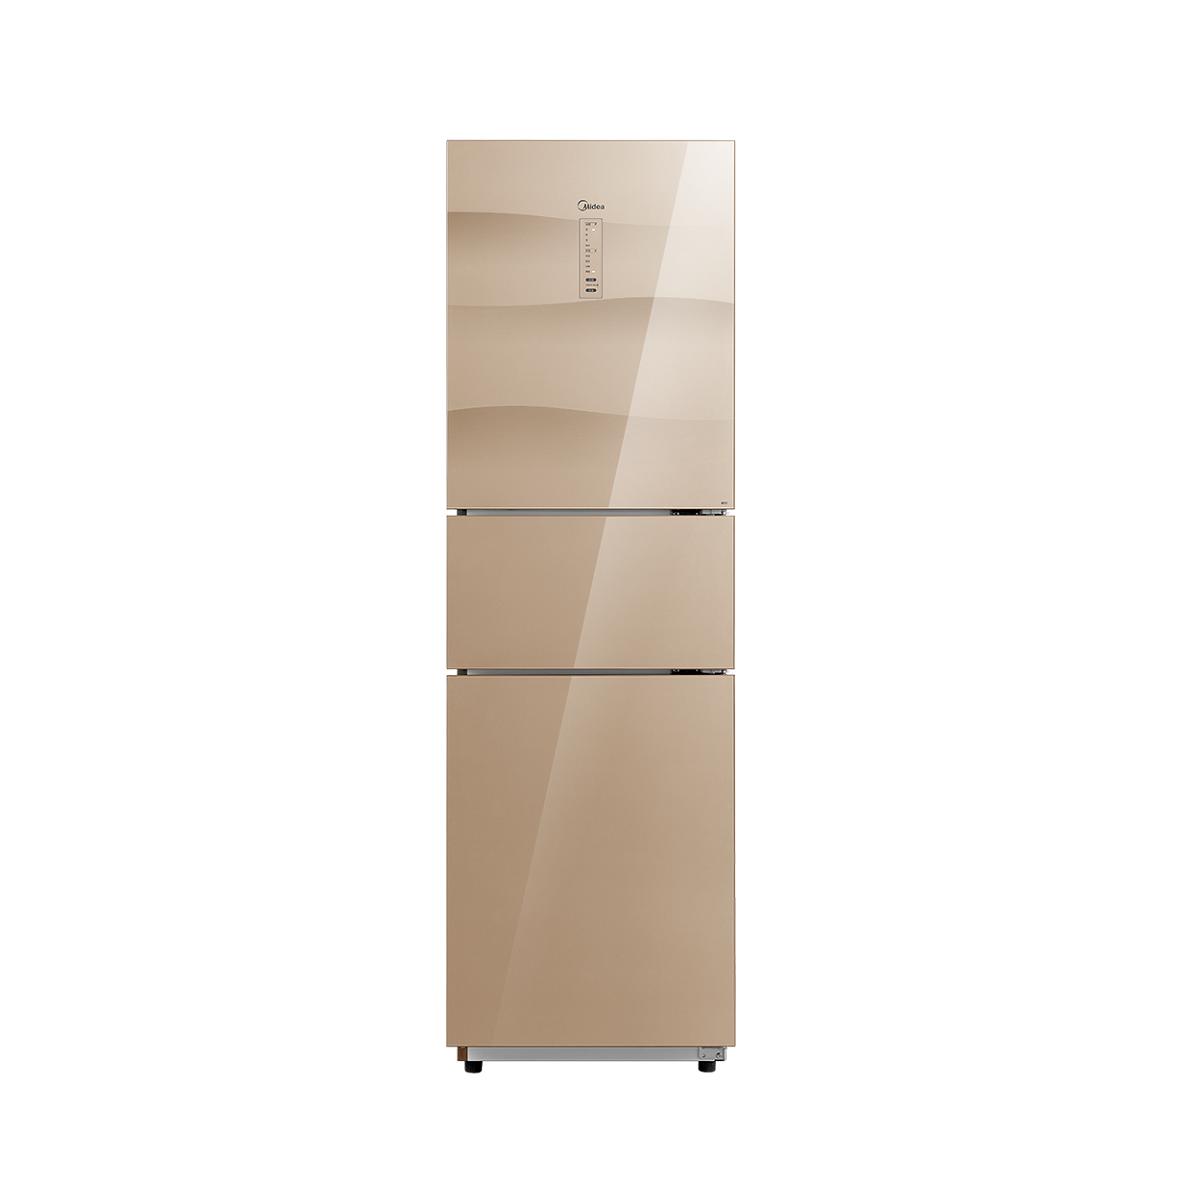 Midea/美的 BCD-226WTGPM(E)冰箱 说明书.pdf